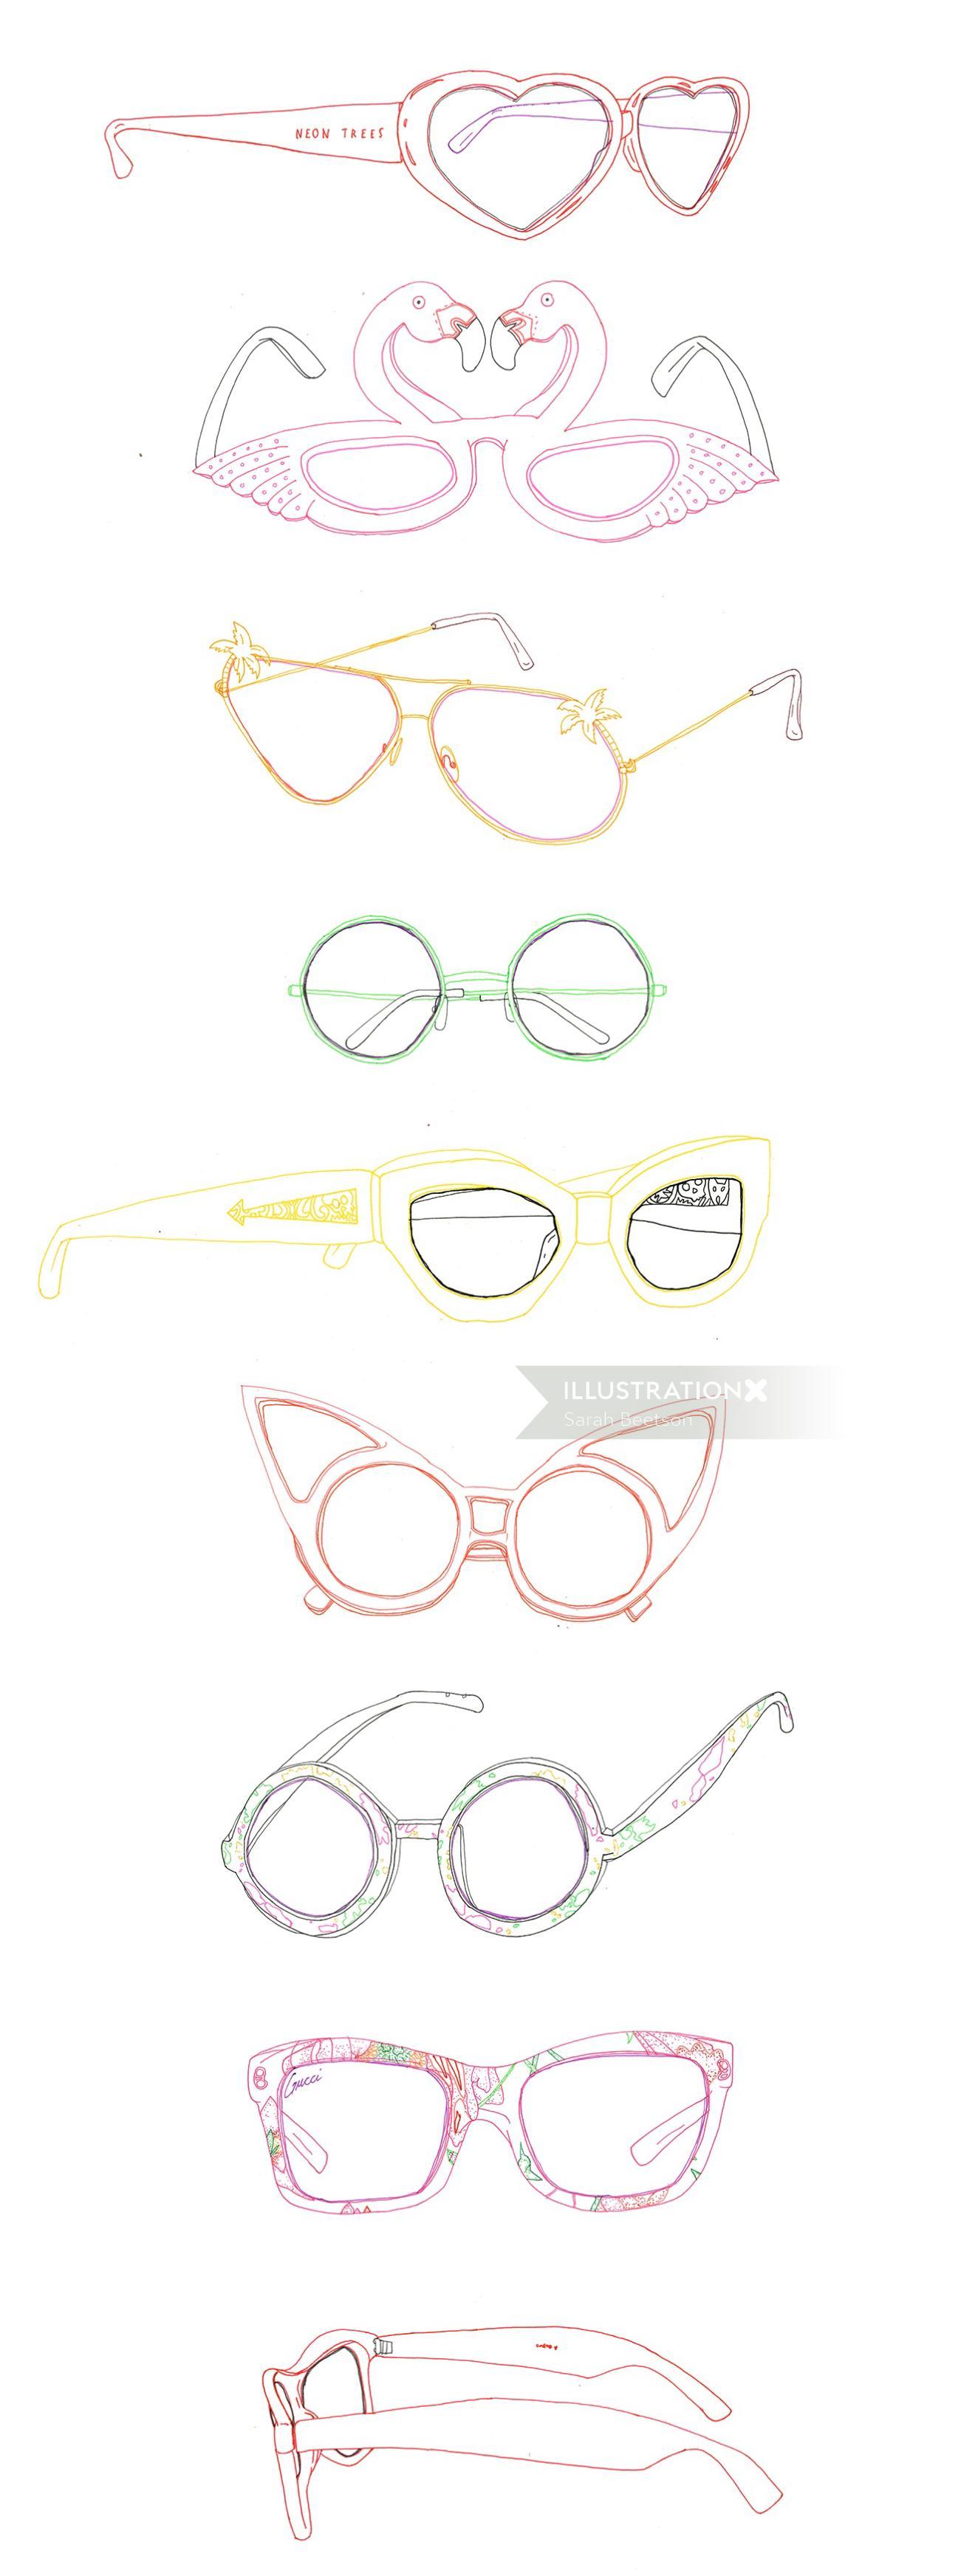 An illustration of summer sunglasses